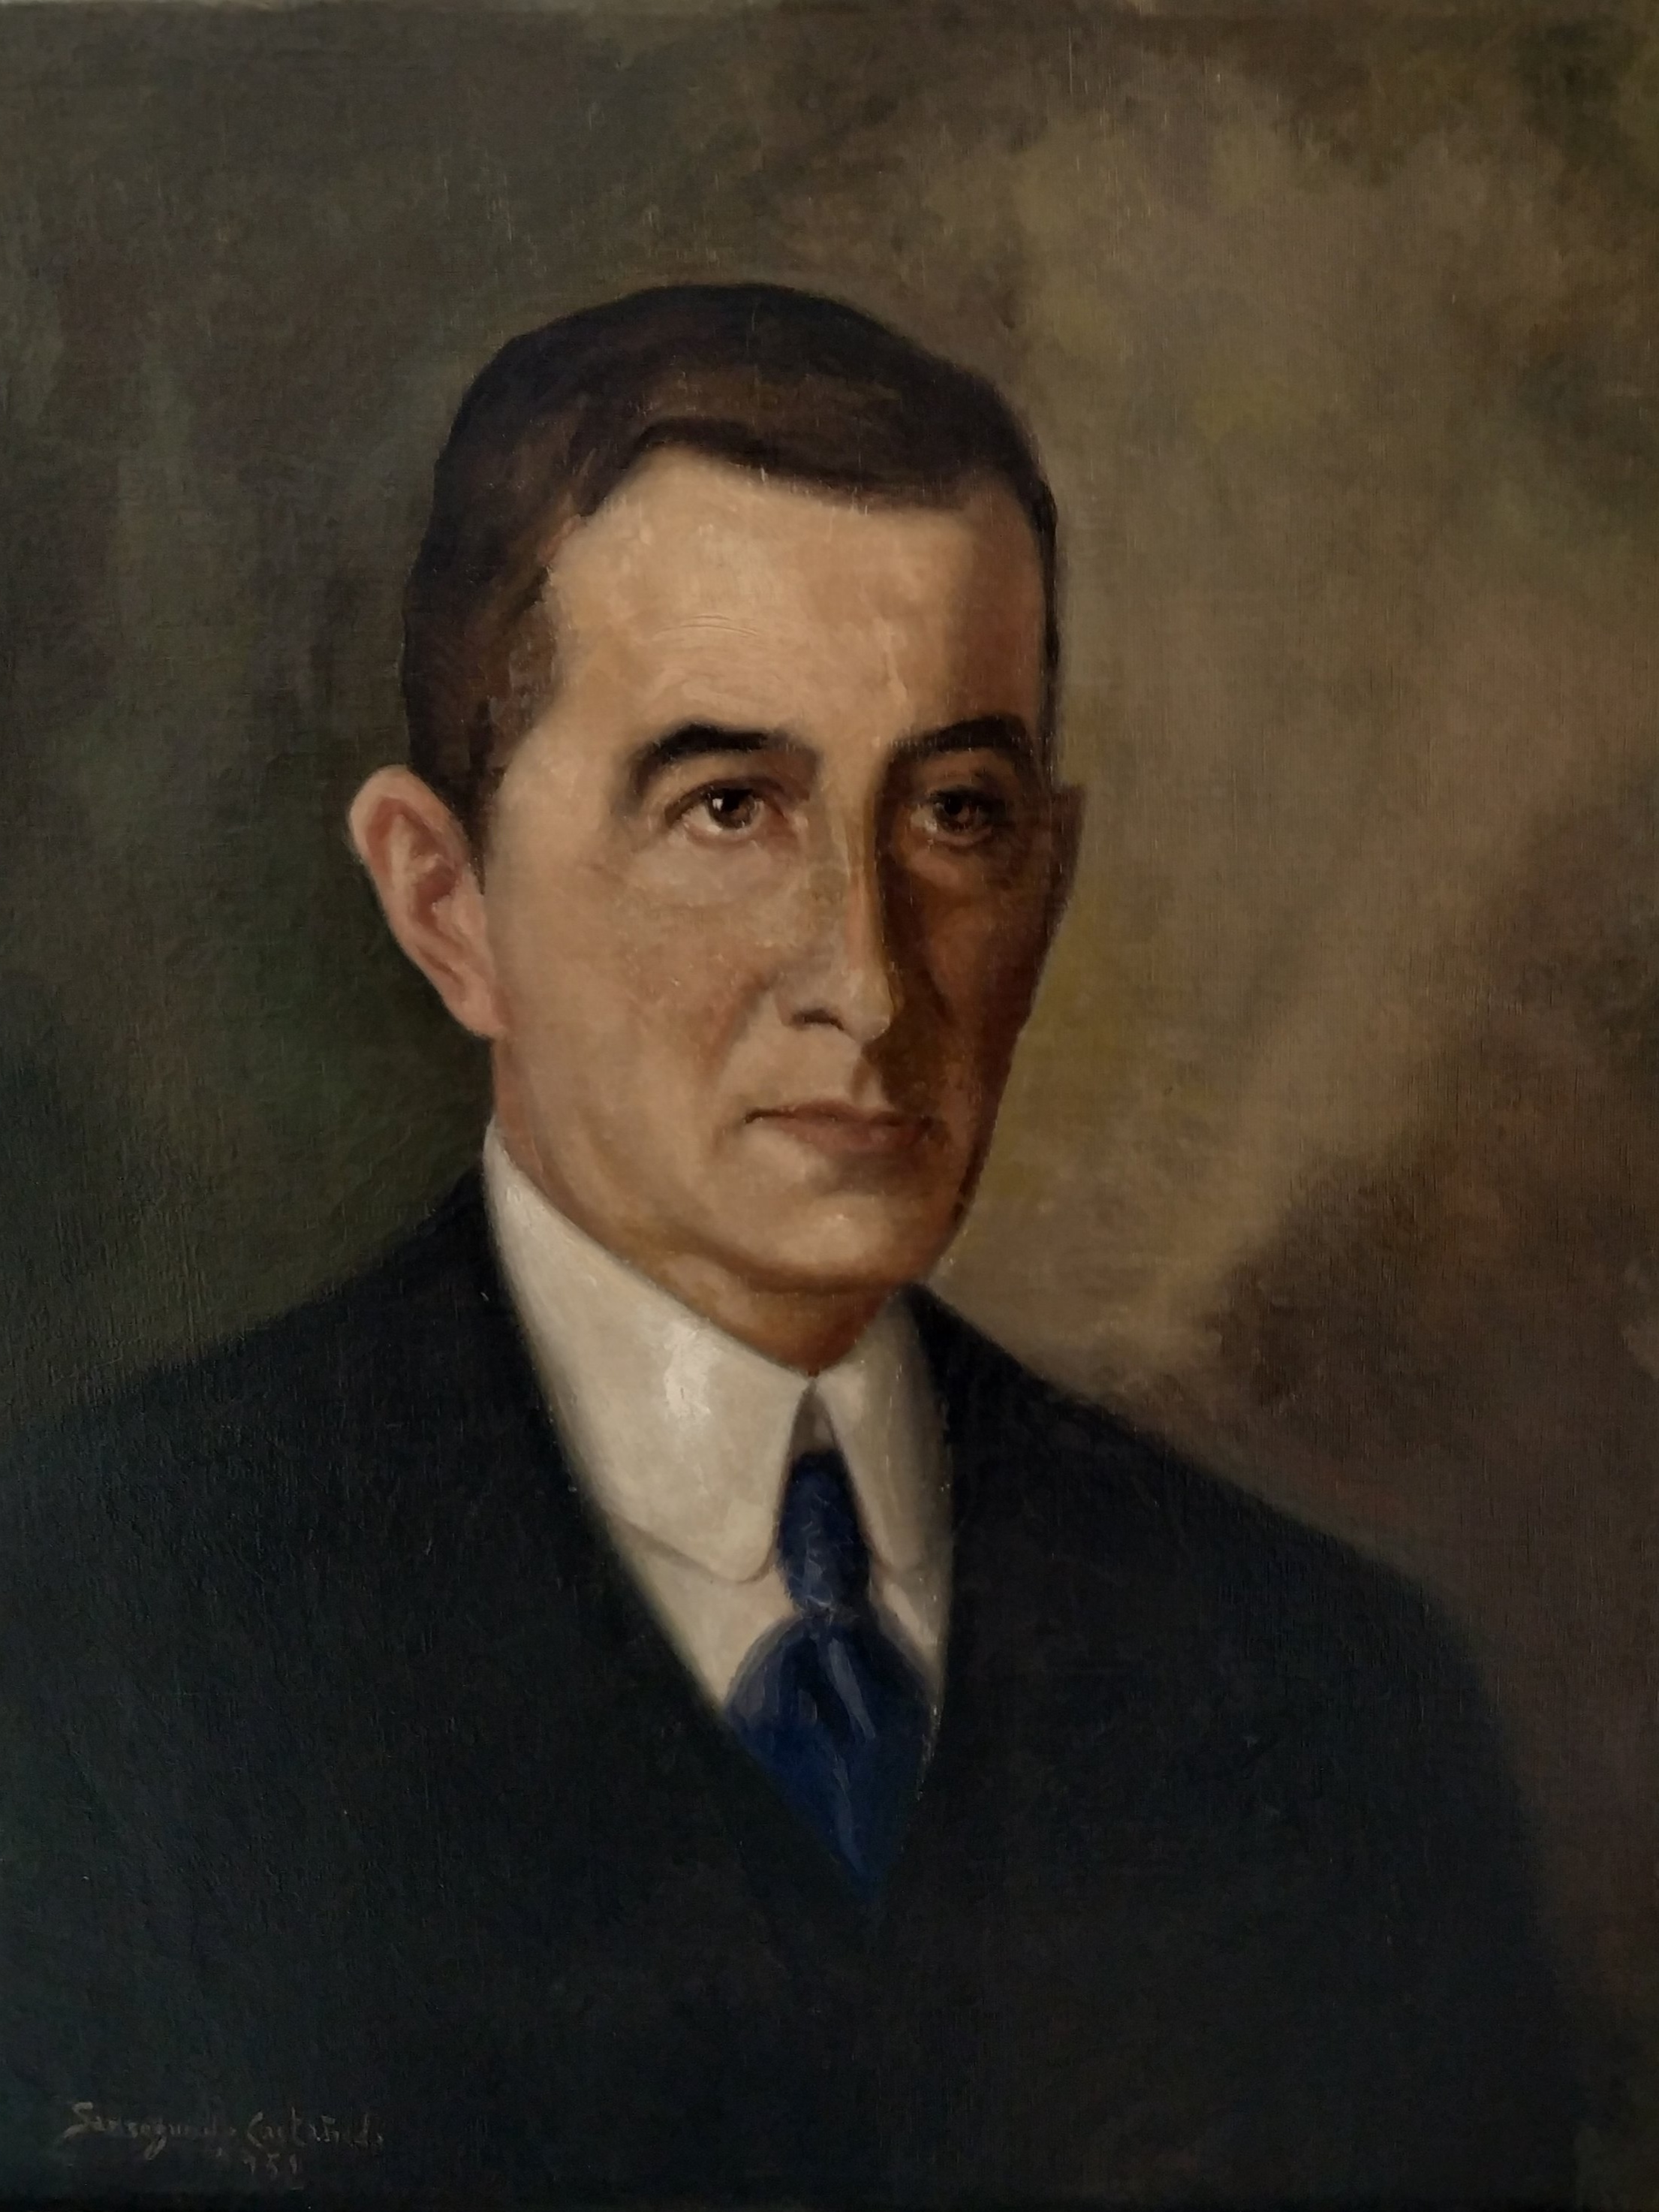 Herminio Lastra 1921-1923